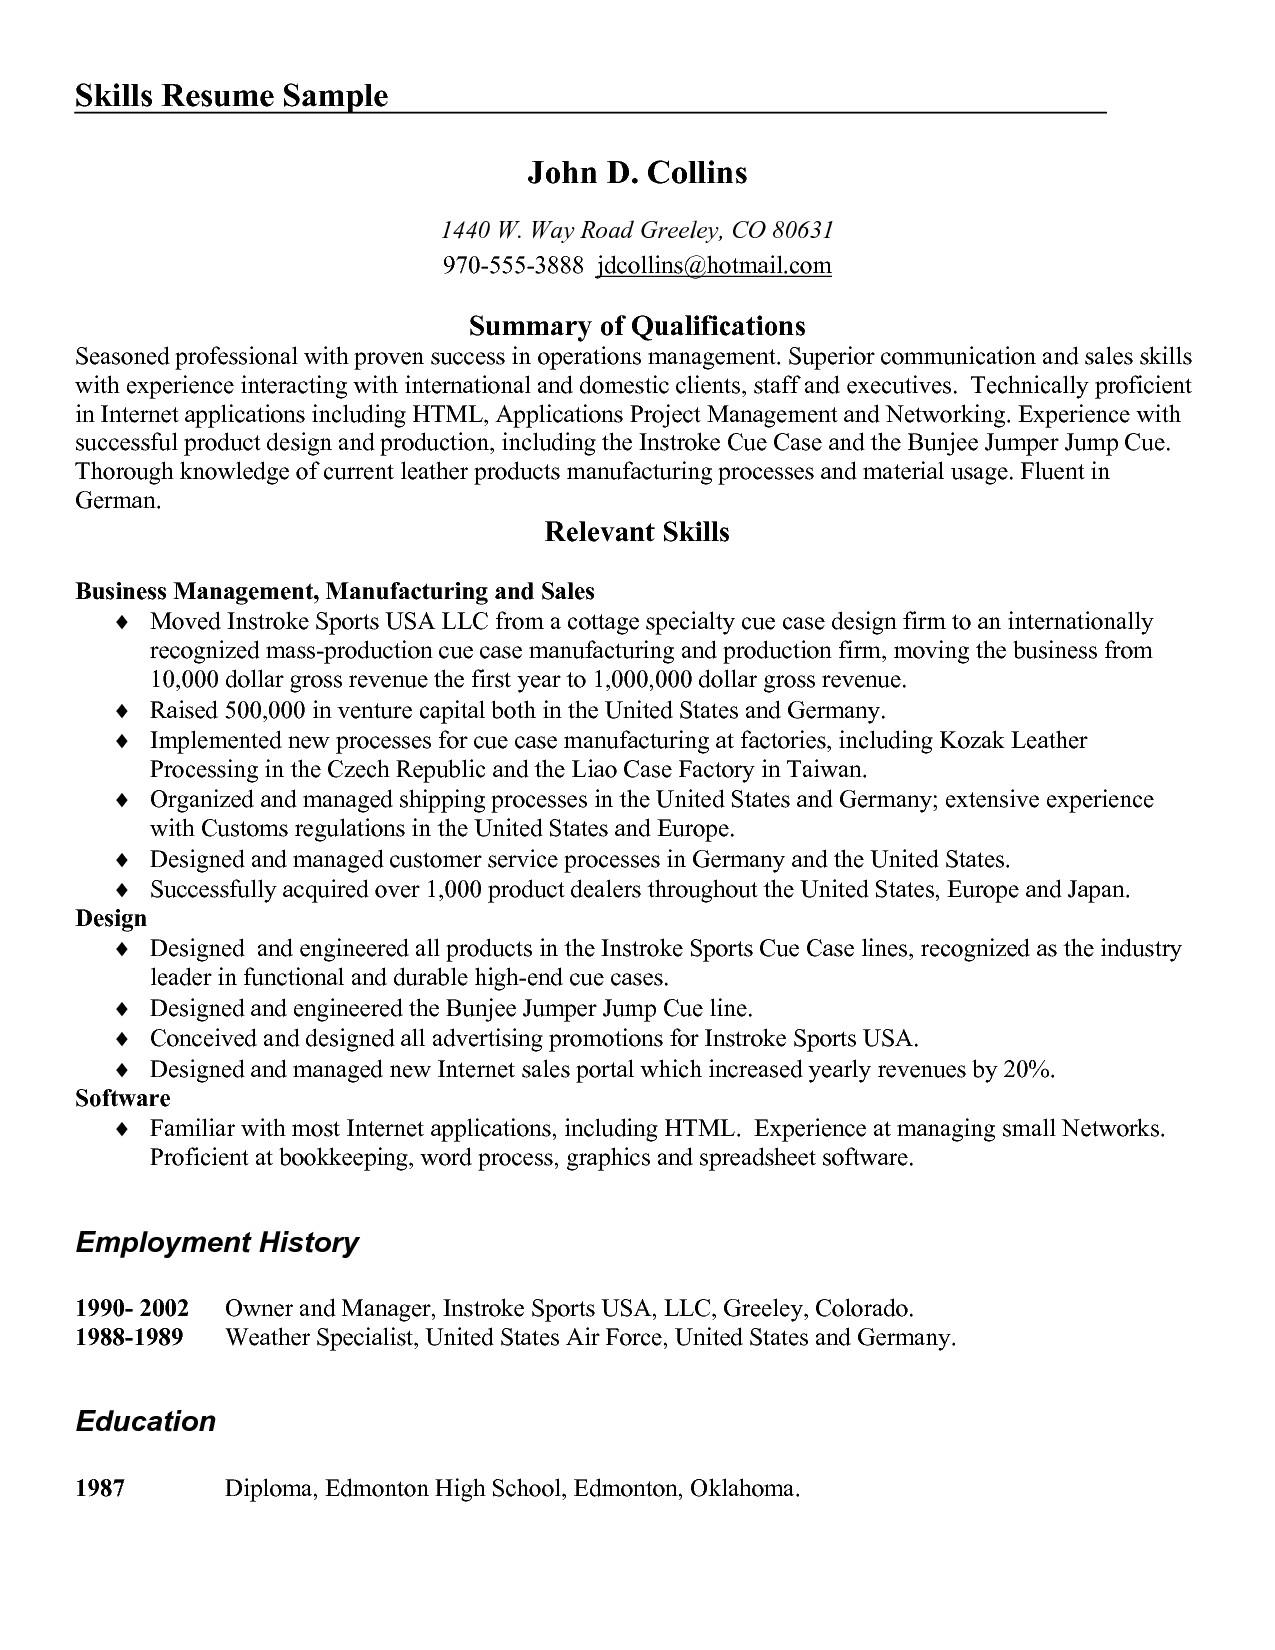 post skills and abilities summary 368637